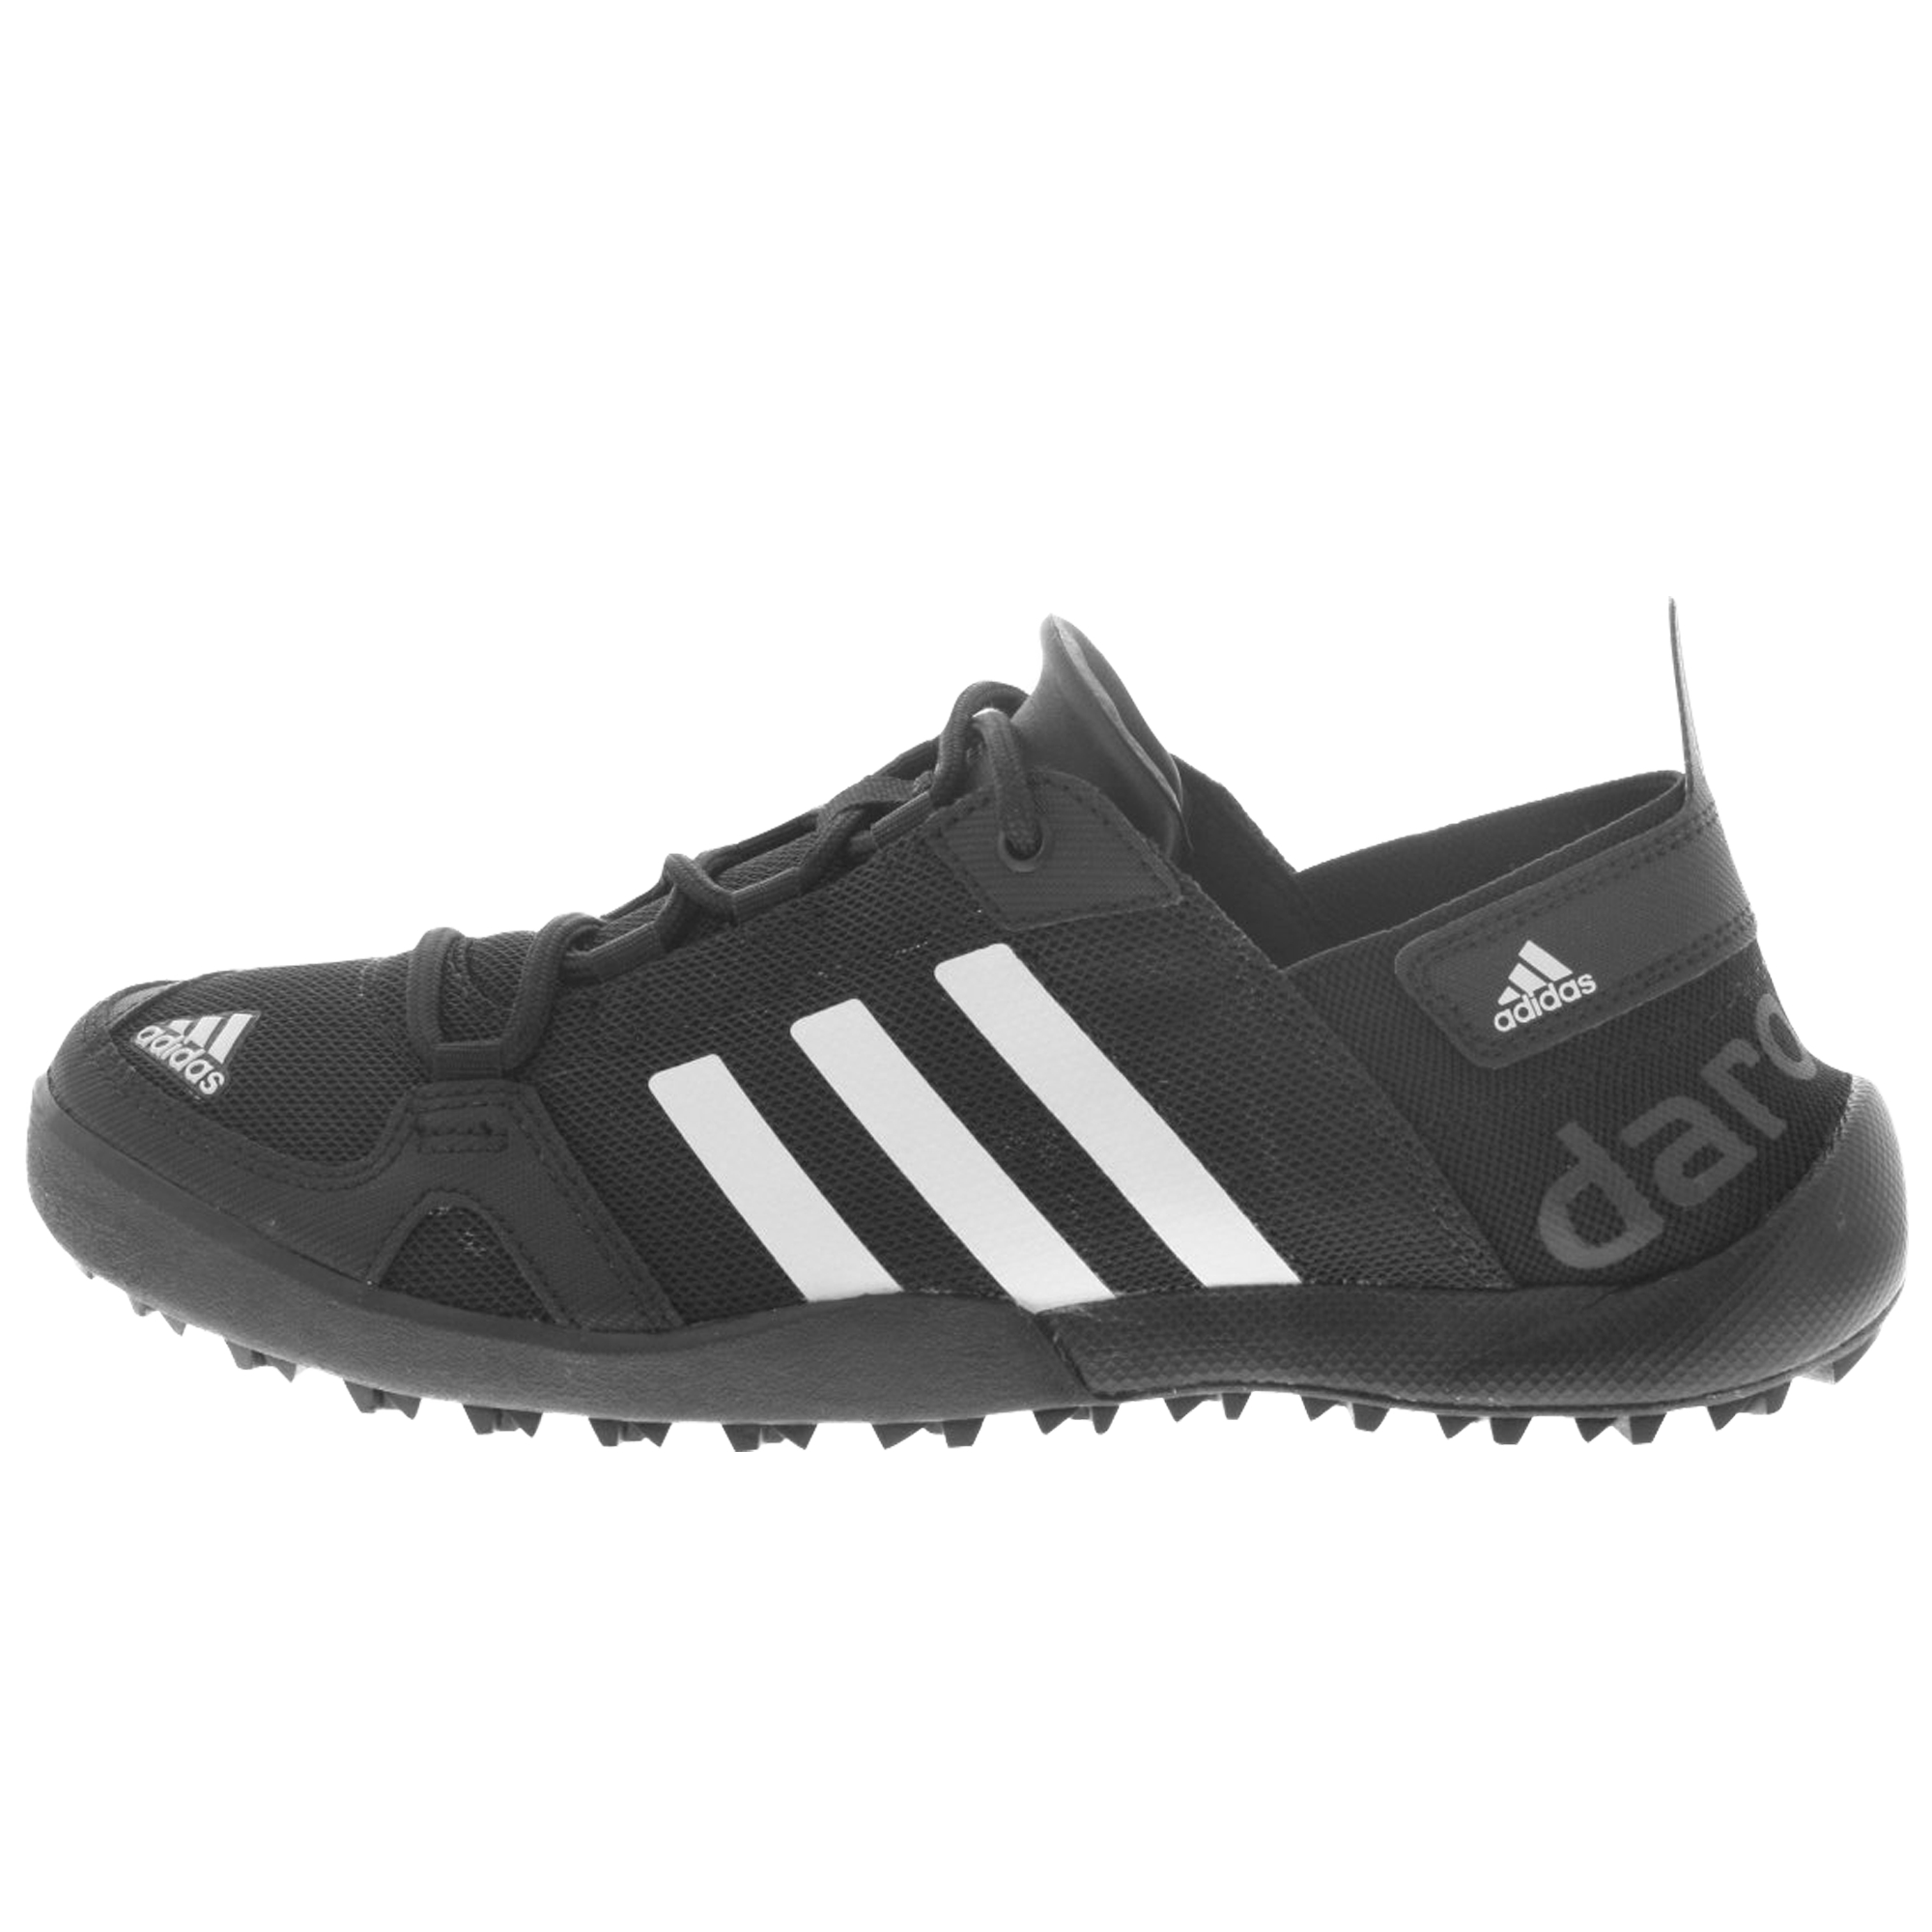 pretty nice 4dccd 7c405 adidas Climacool Daroga Two 13 Erkek Spor Ayakkabı